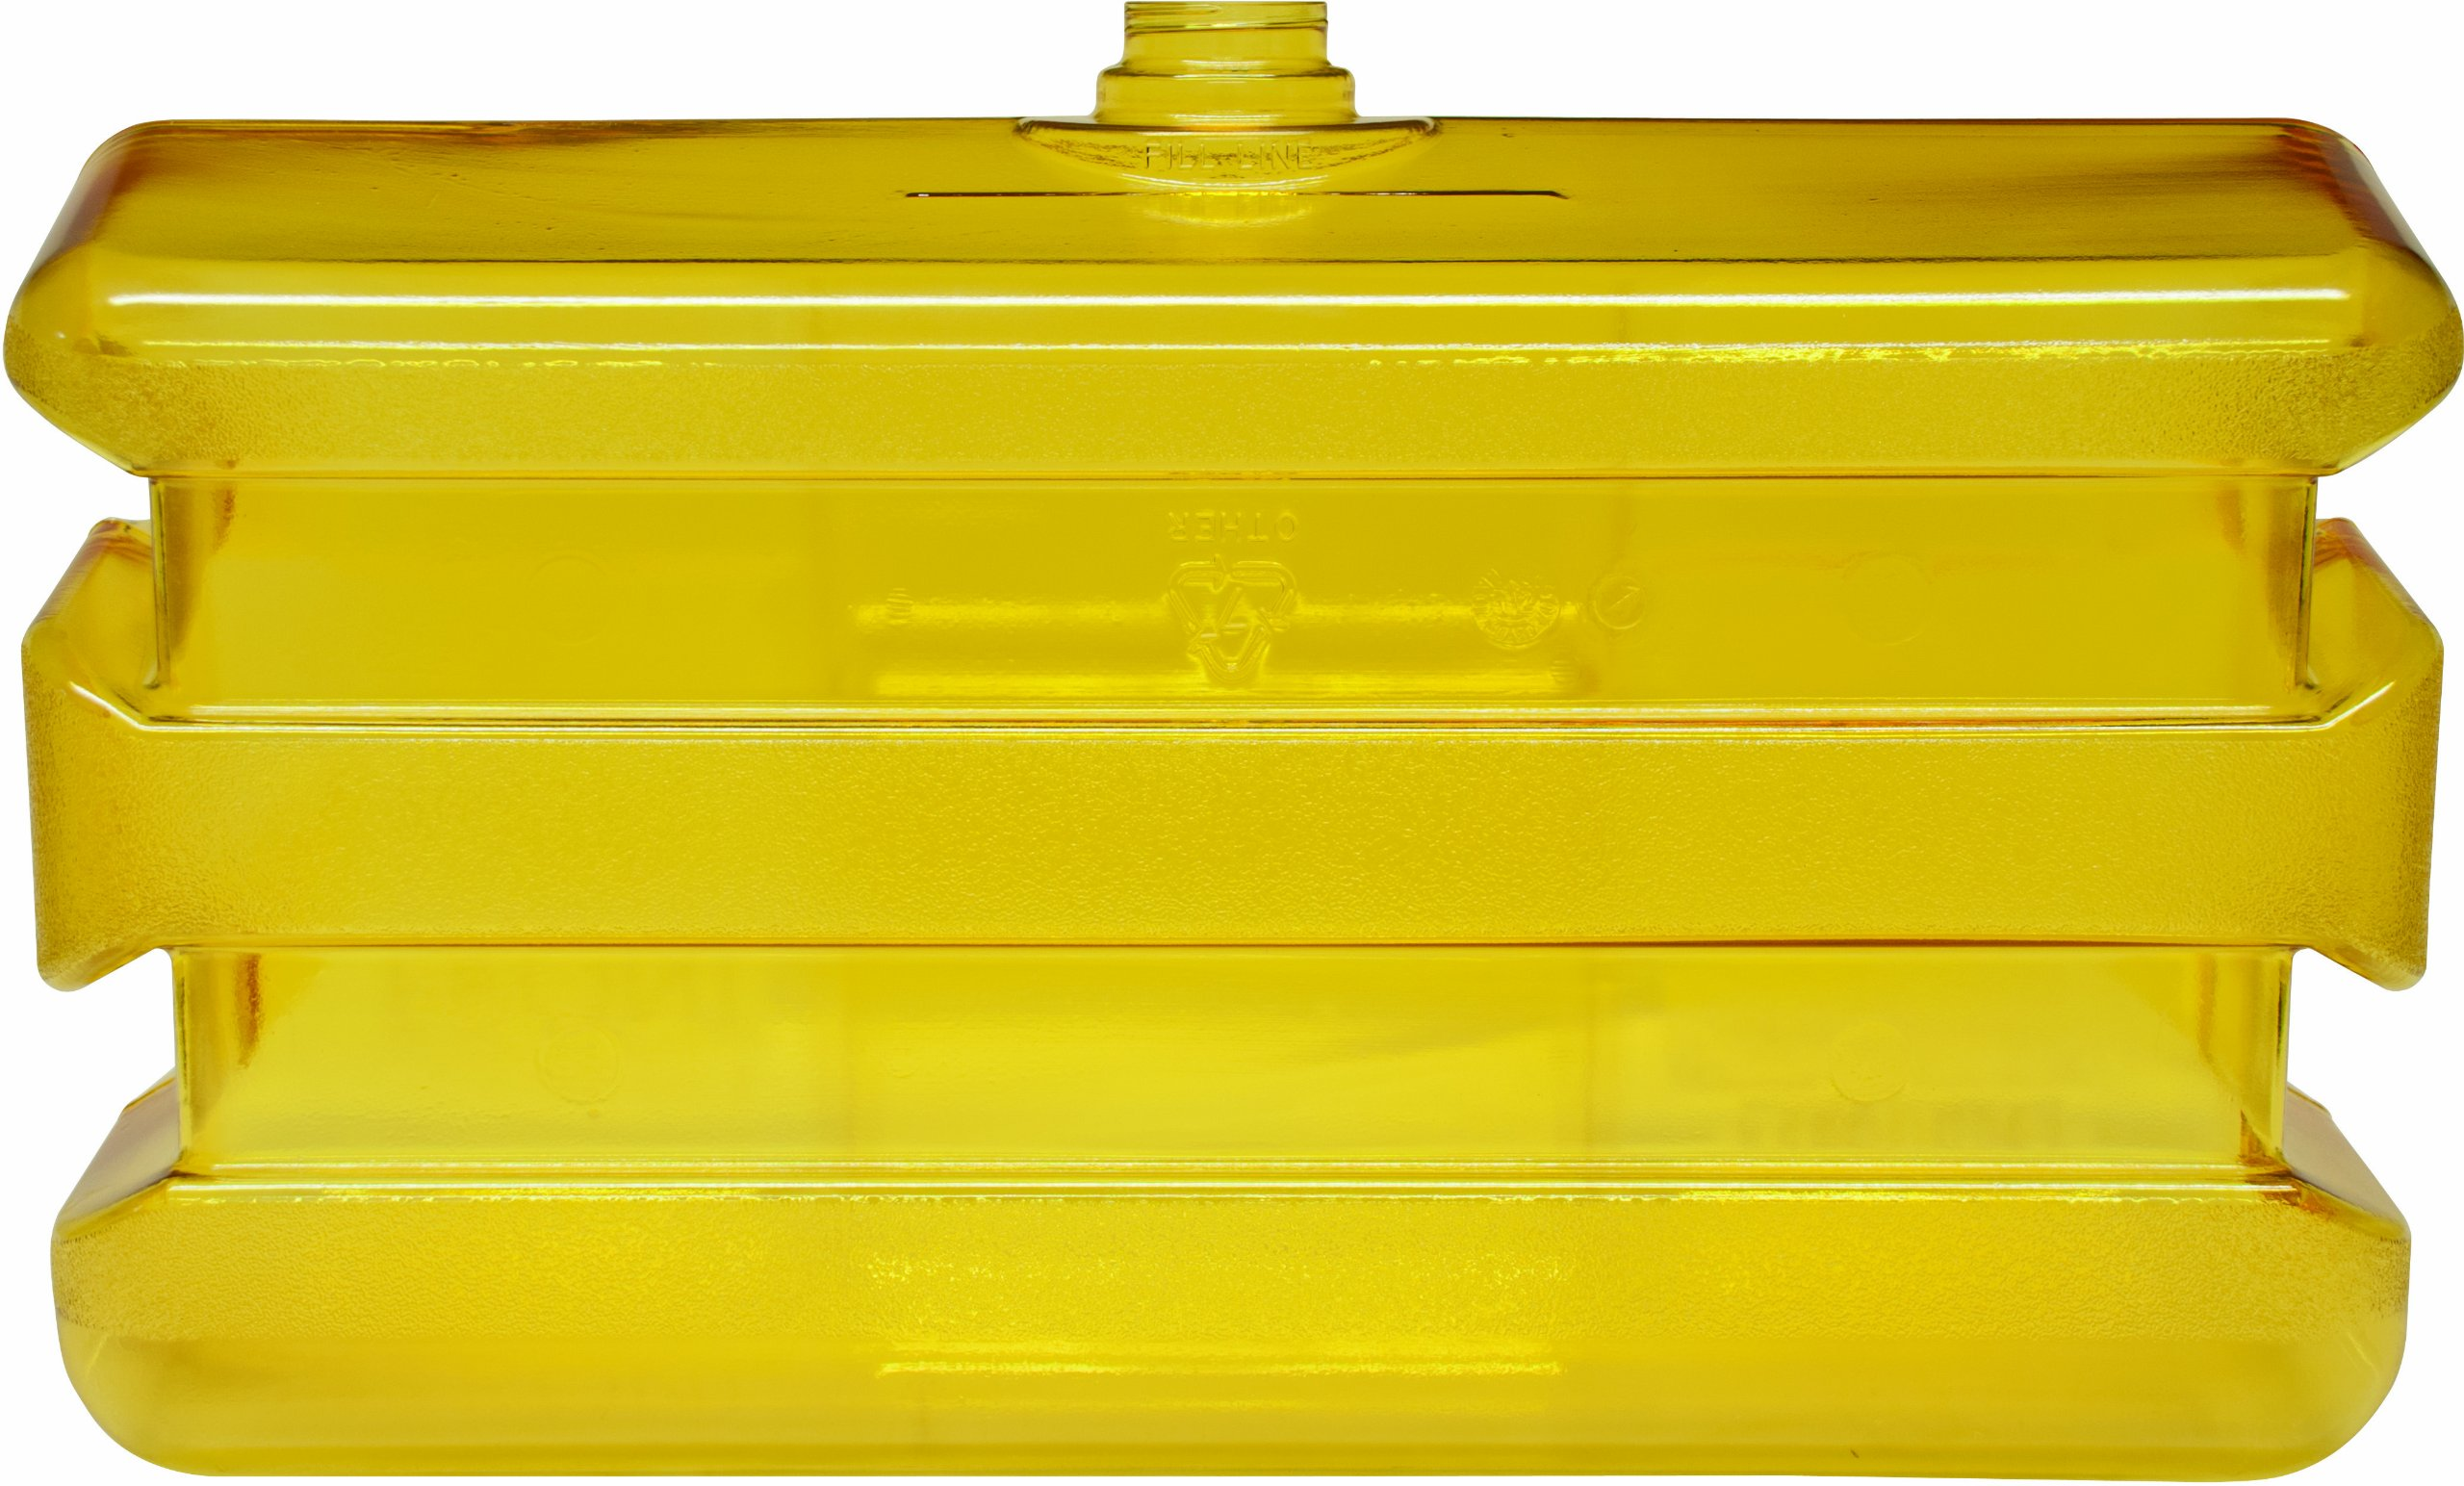 Bradley 133-140 Polycarbonate On-Site Portable Eyewash Tank, Clear/Yellow by Bradley Emergency Fixtures